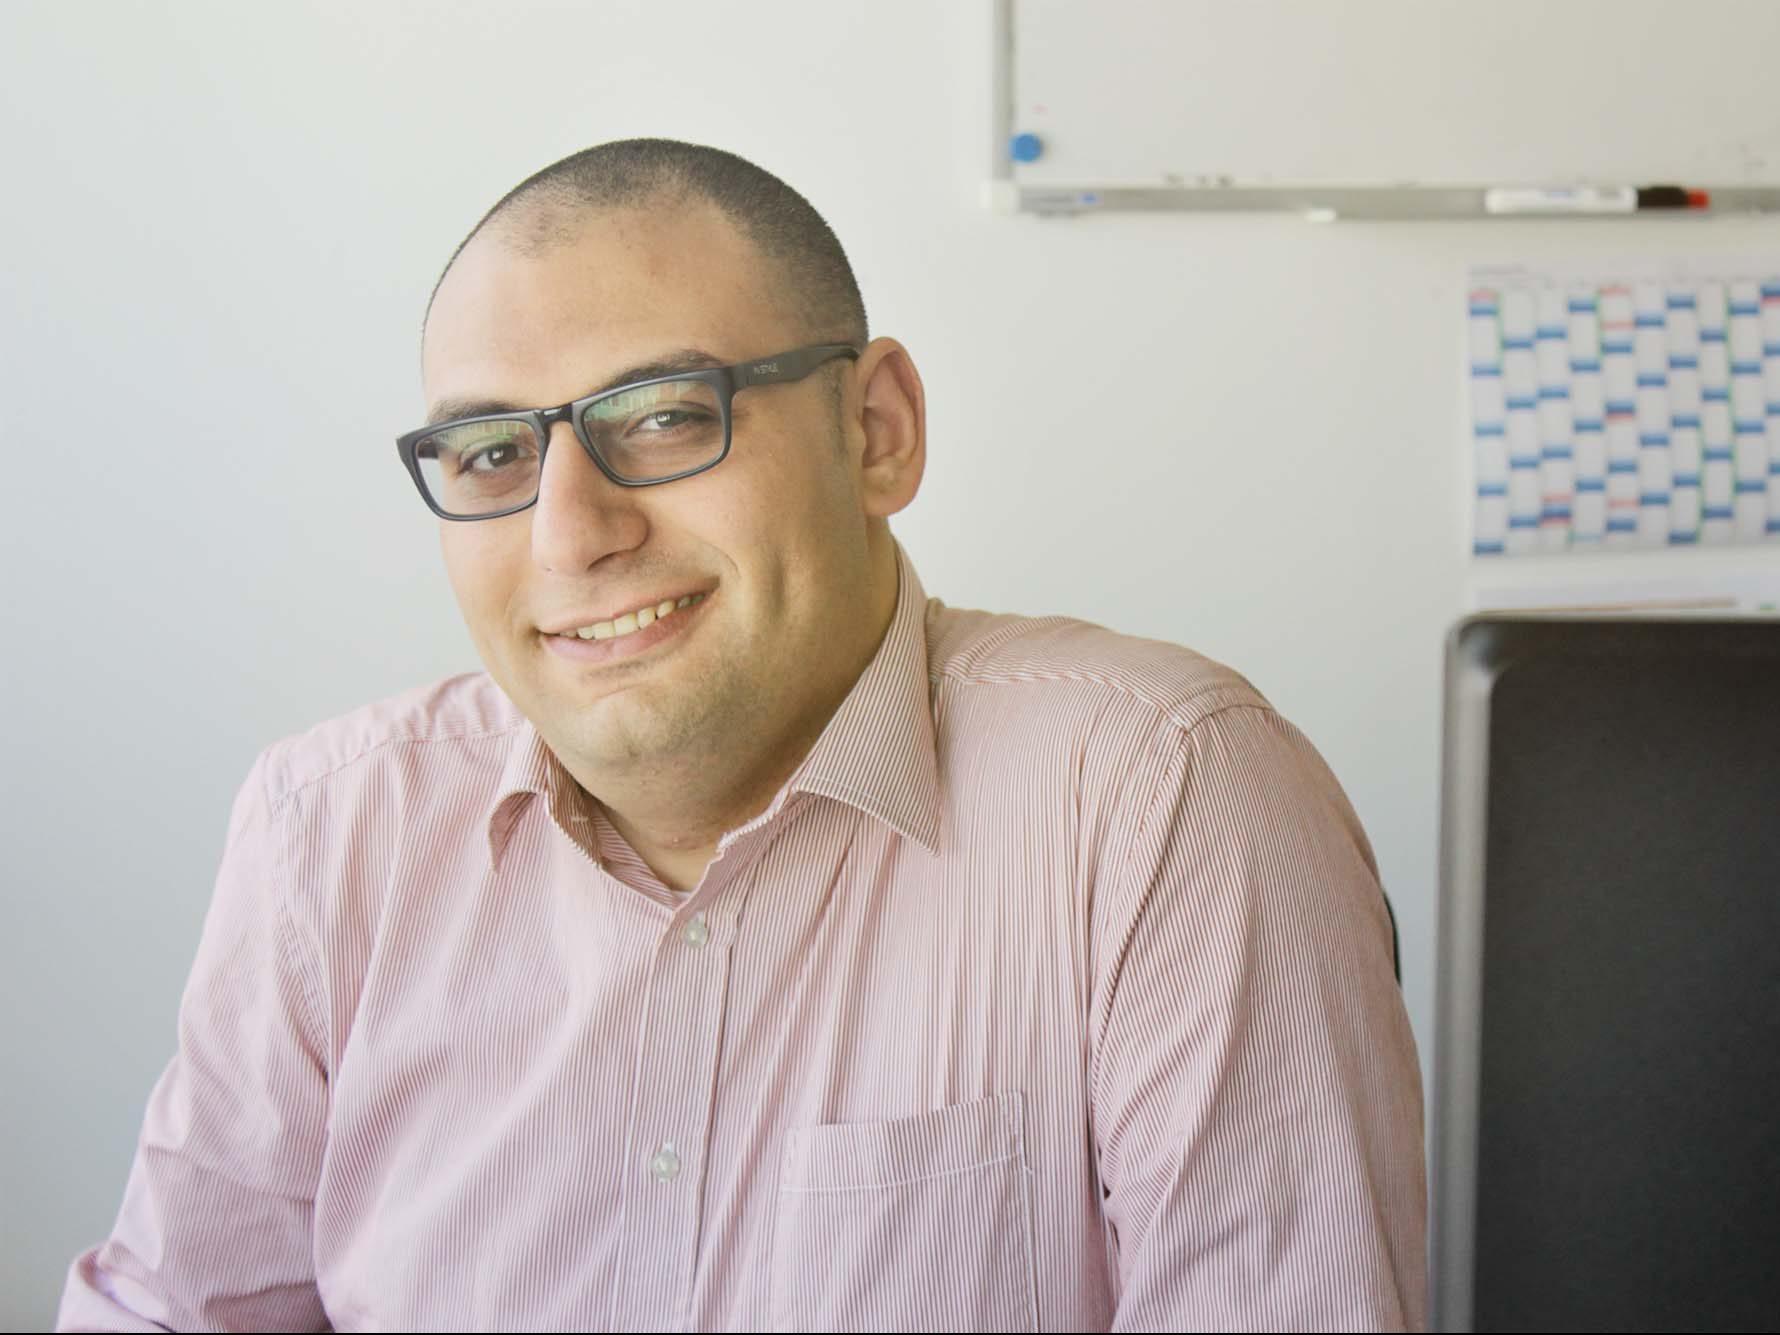 Mohamed Shalaby